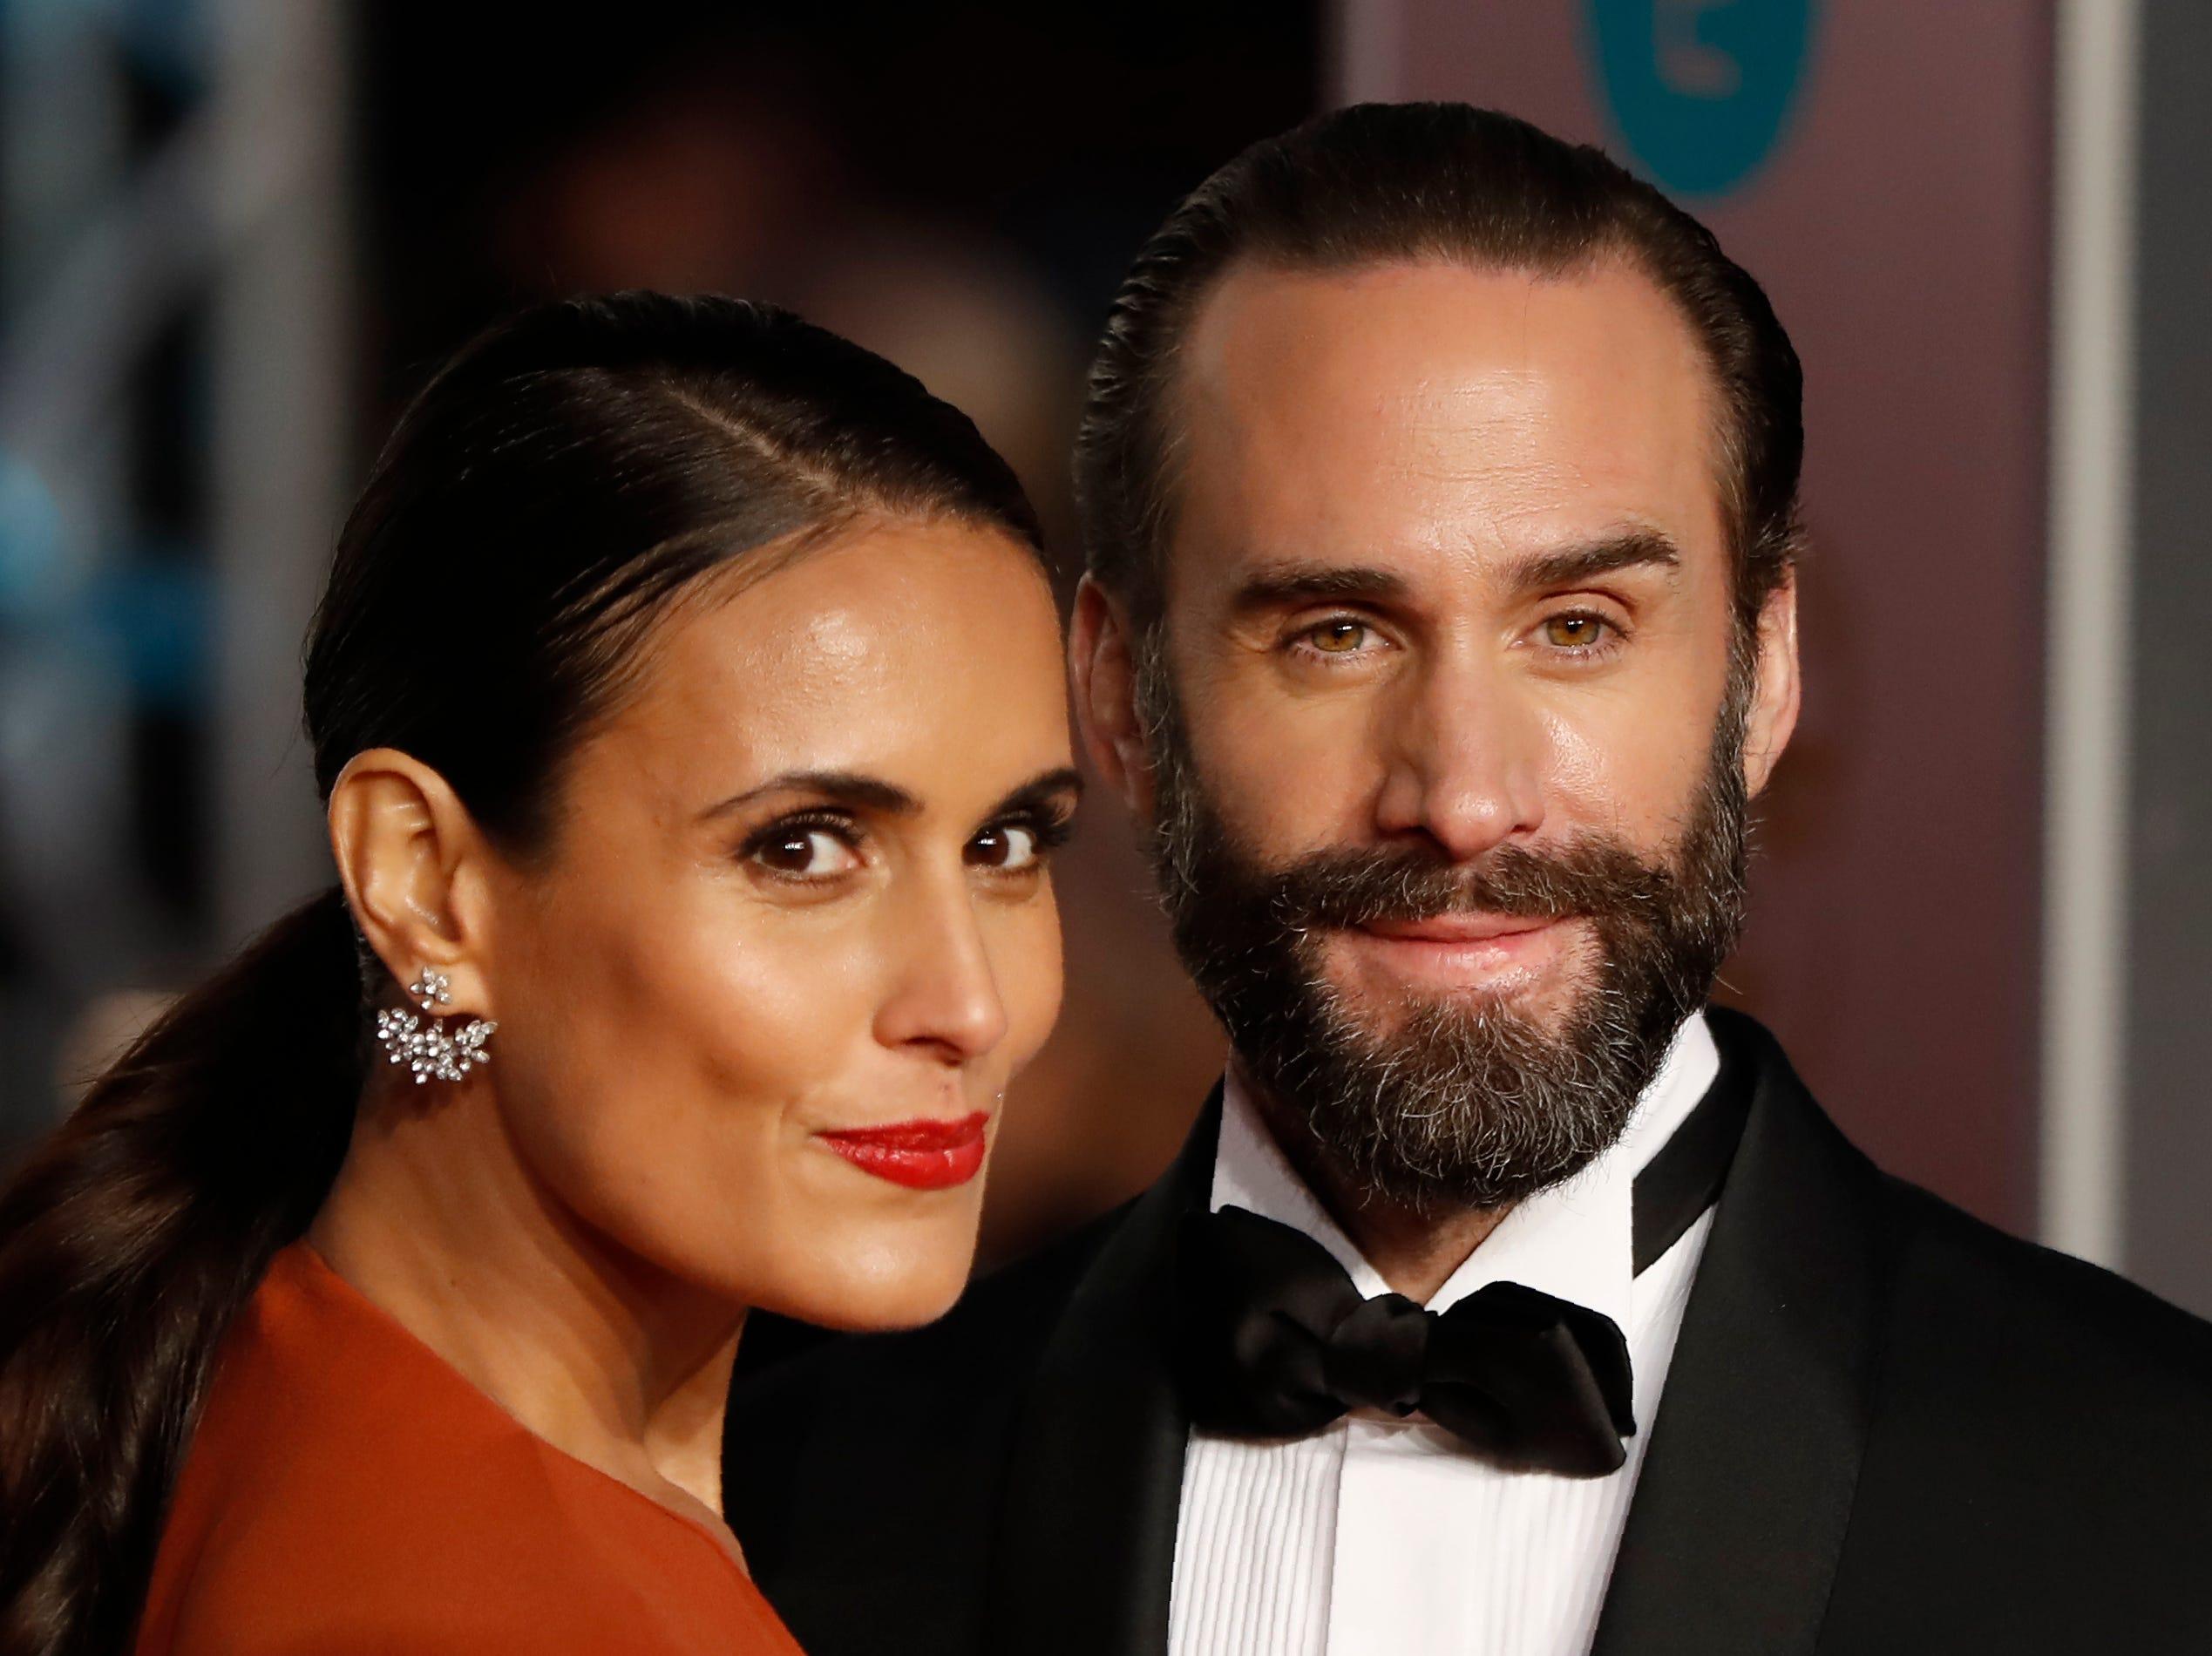 Joseph Fiennes and Maria Dolores Dieguez